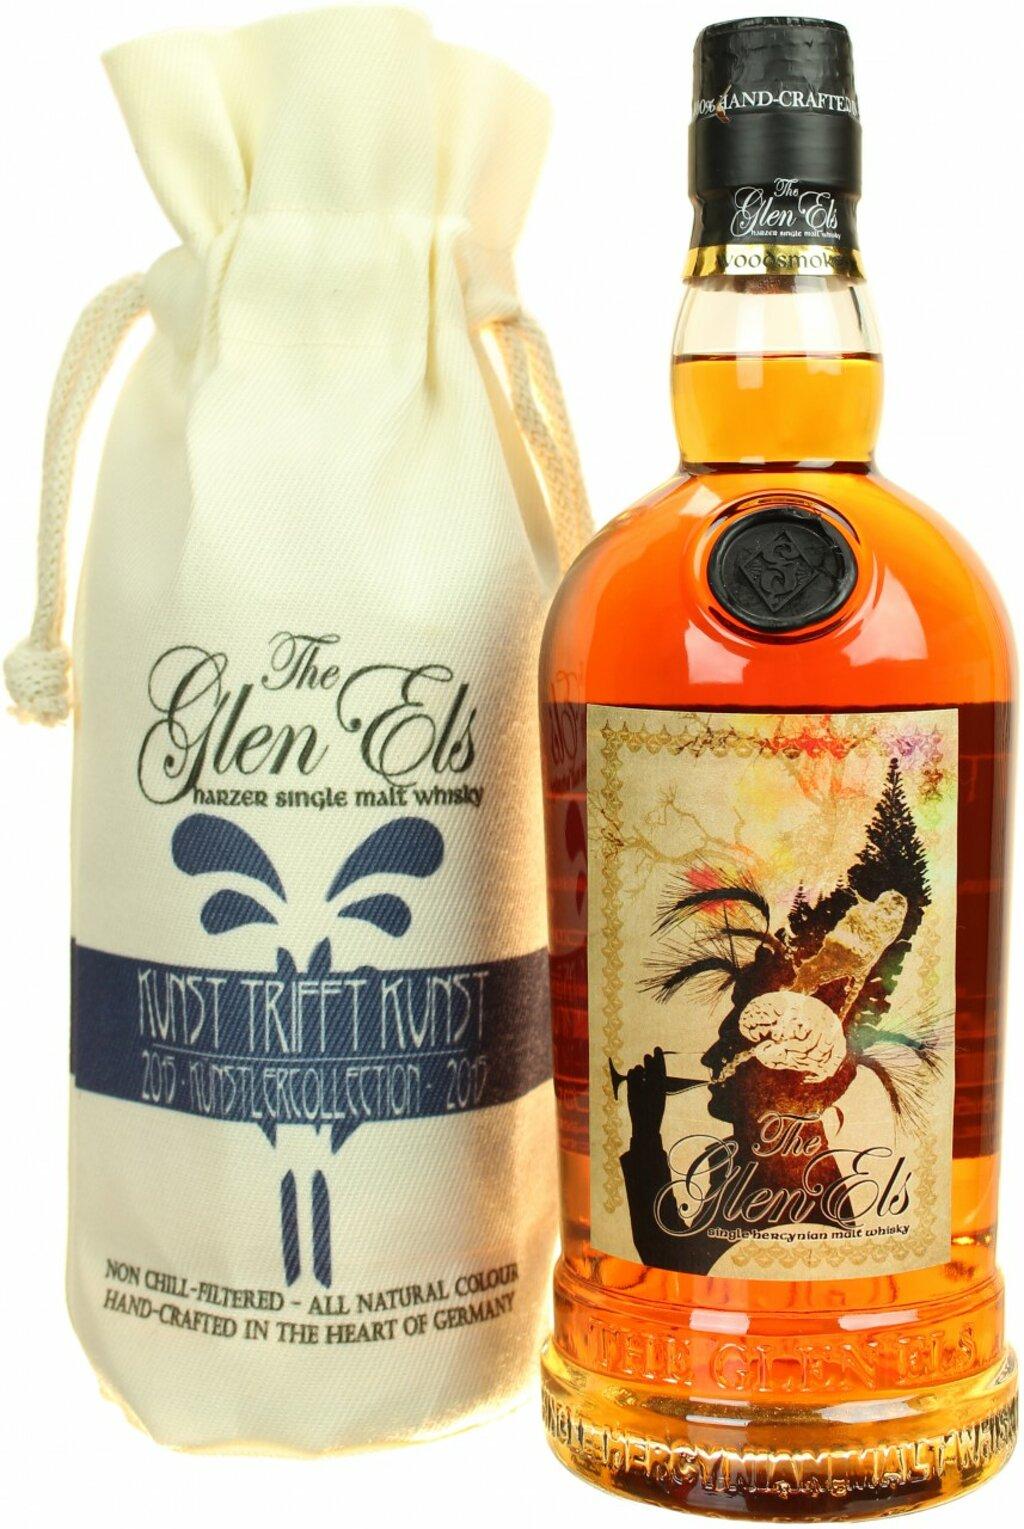 Glen Els Whisky Künstleredition c Whiskyzone